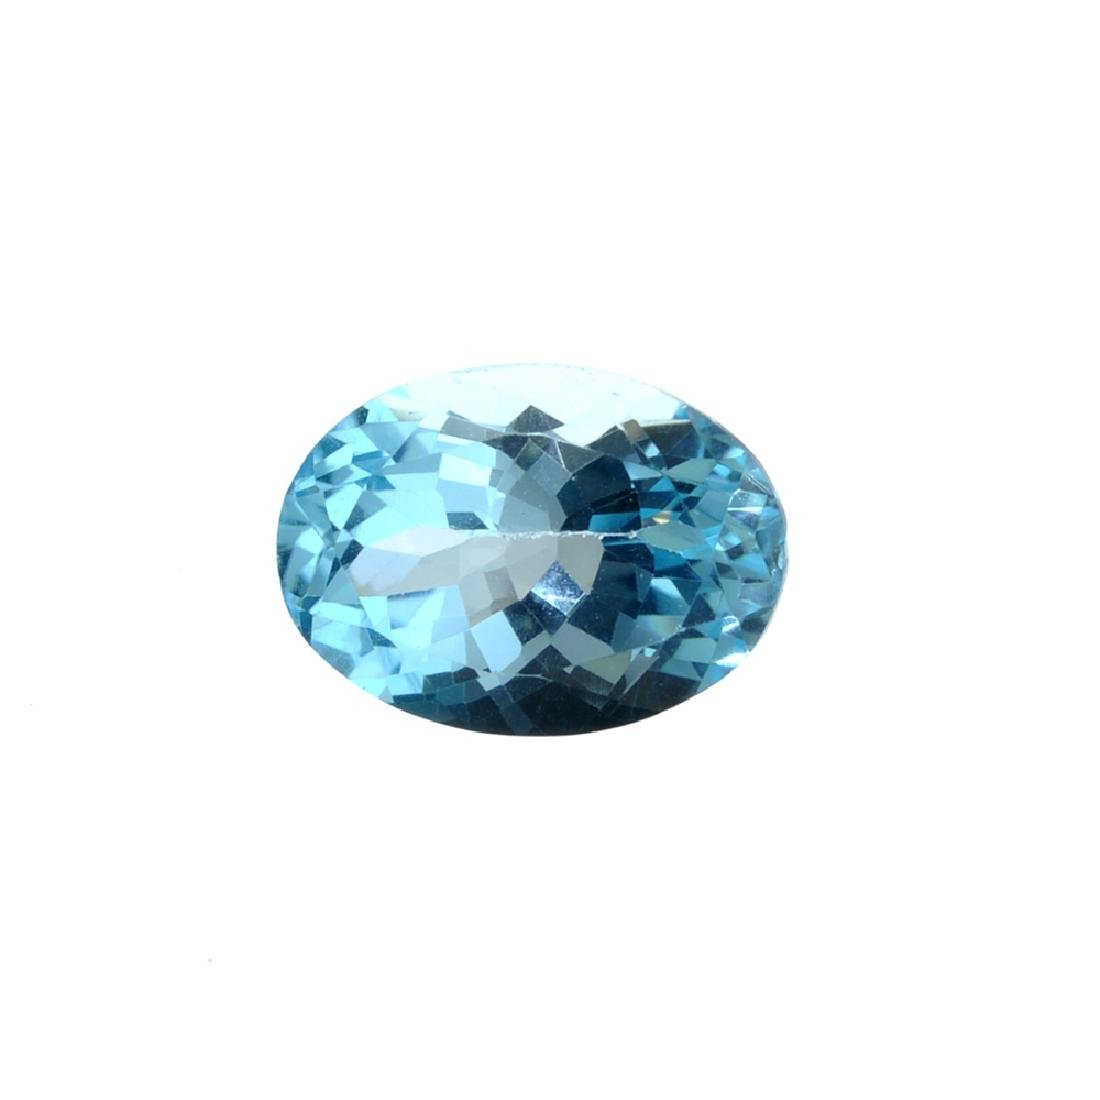 APP: 0.5k 15.97CT Oval Cut Blue Topaz Gemstone